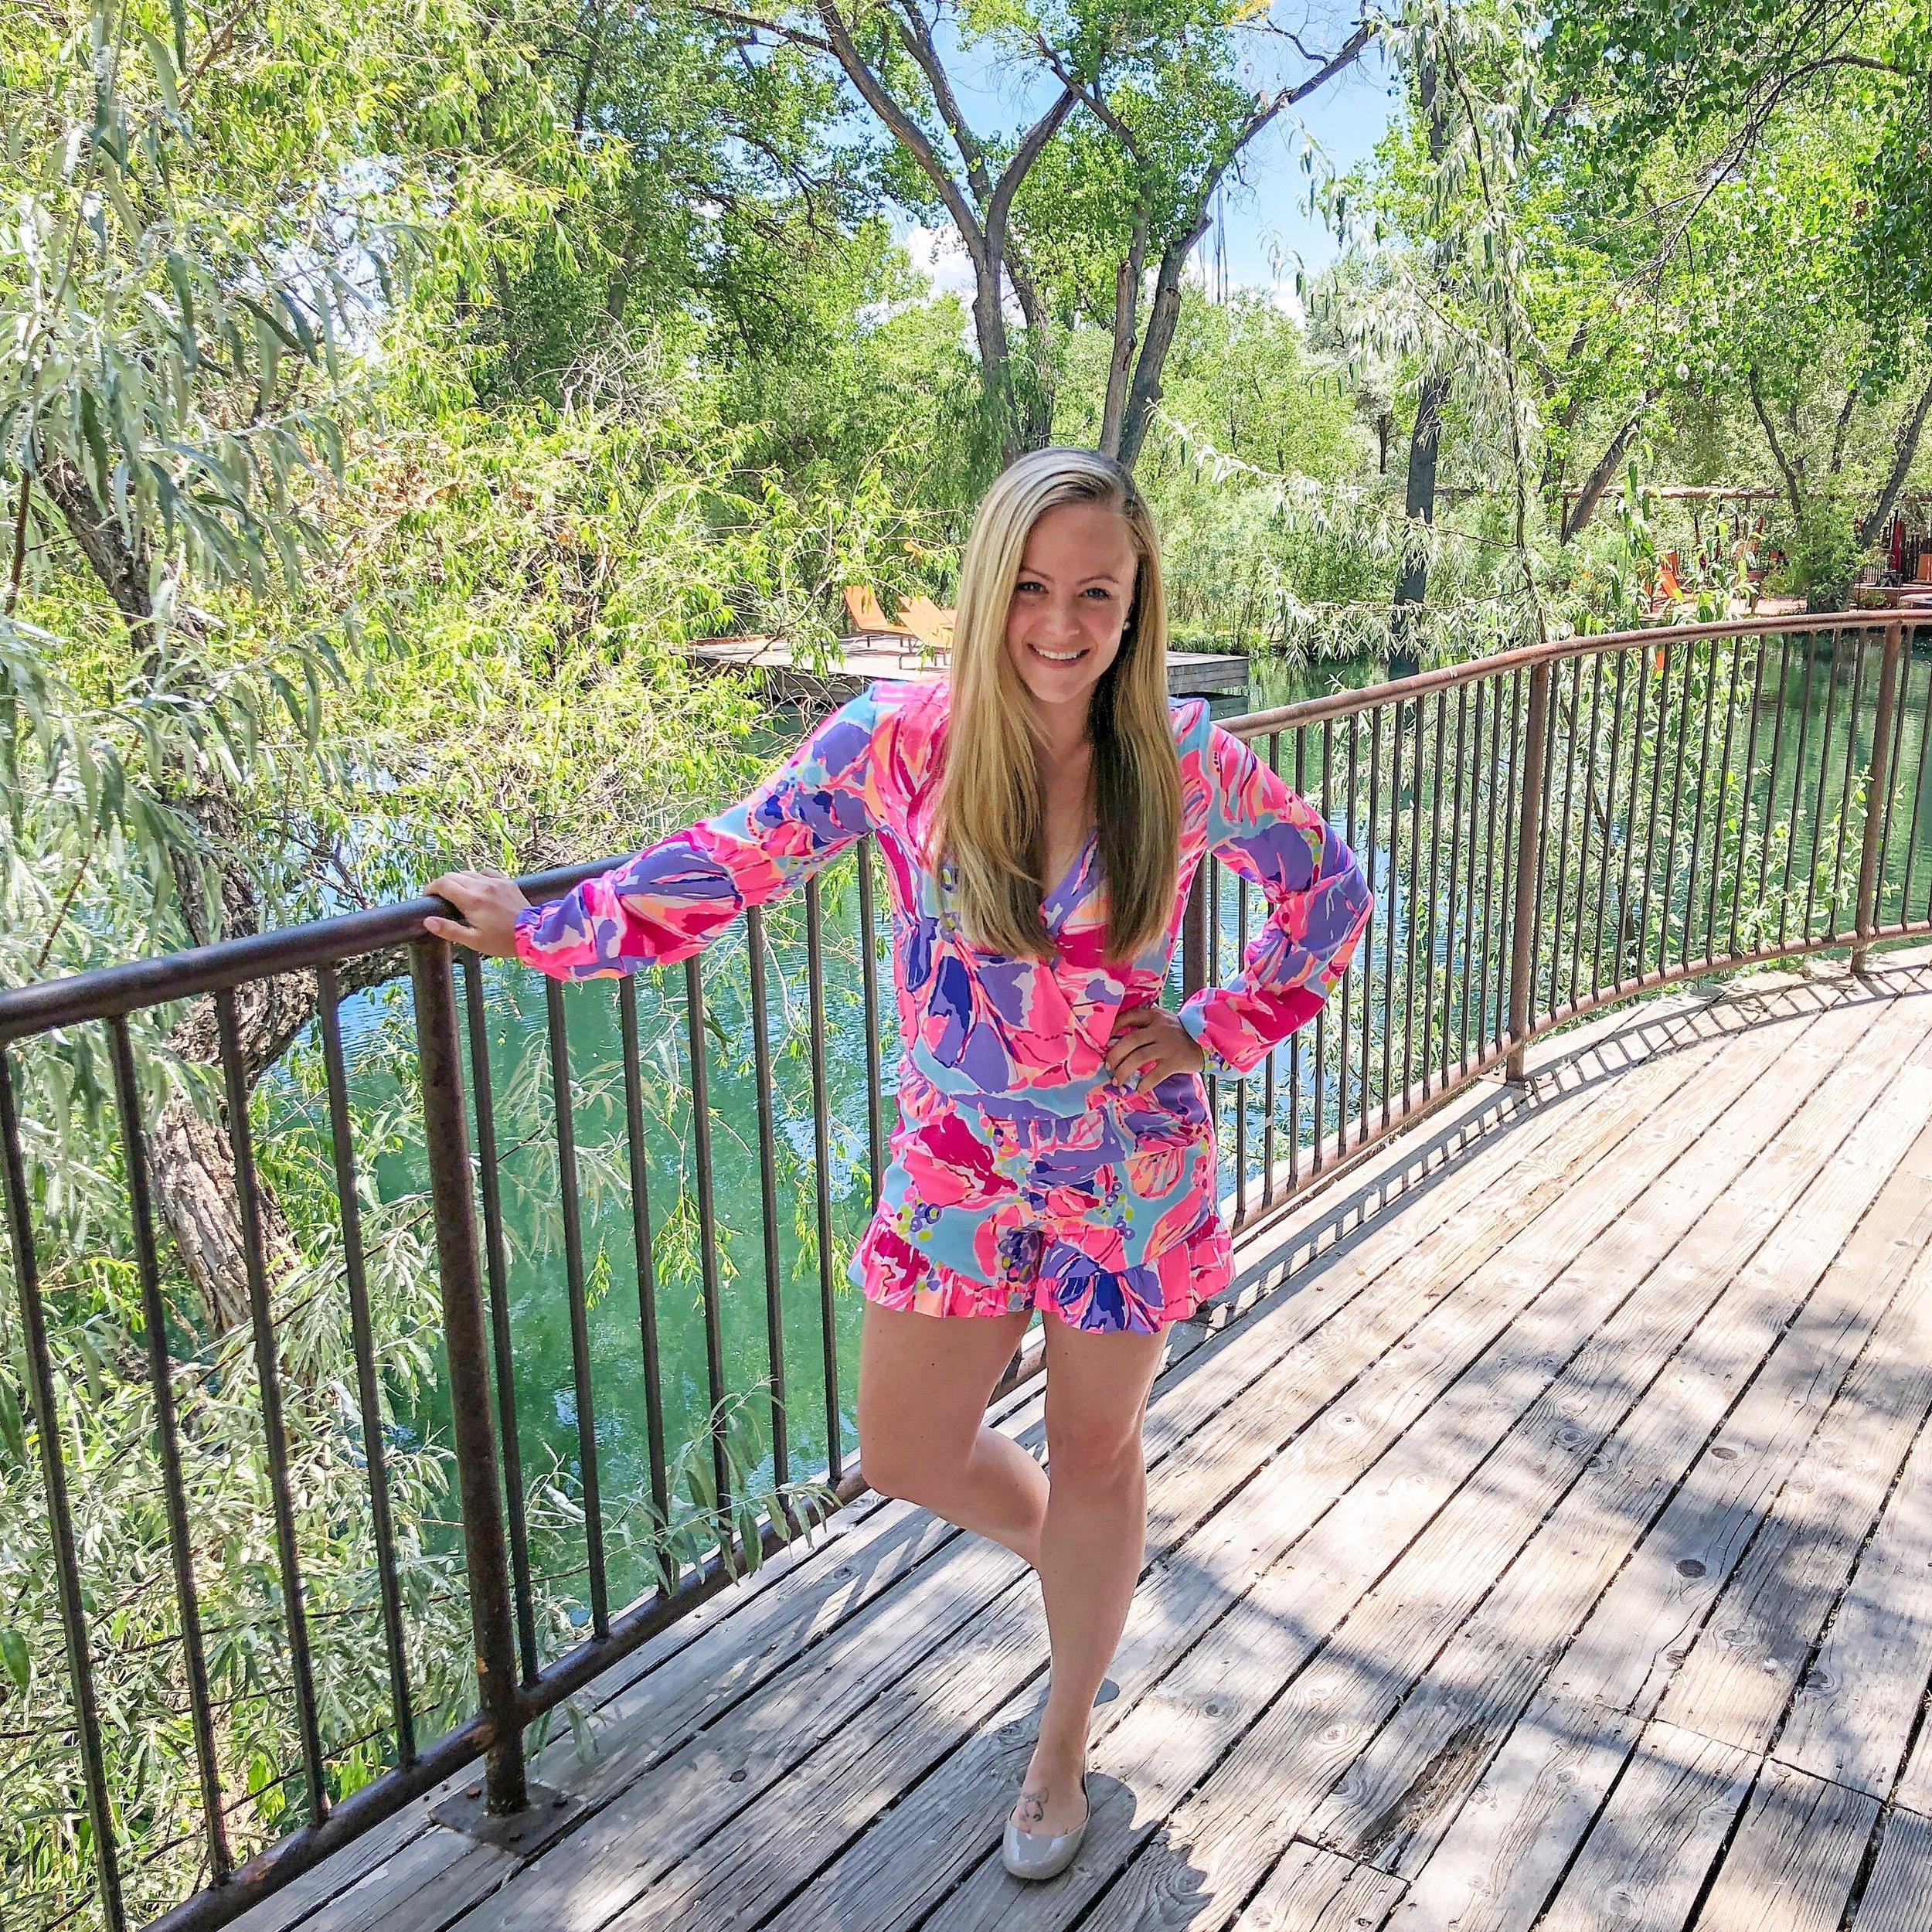 Caitlin Elizabeth Jenkins Santa Fe New Mexico Instagram Influencer @caitlinephoto.JPG